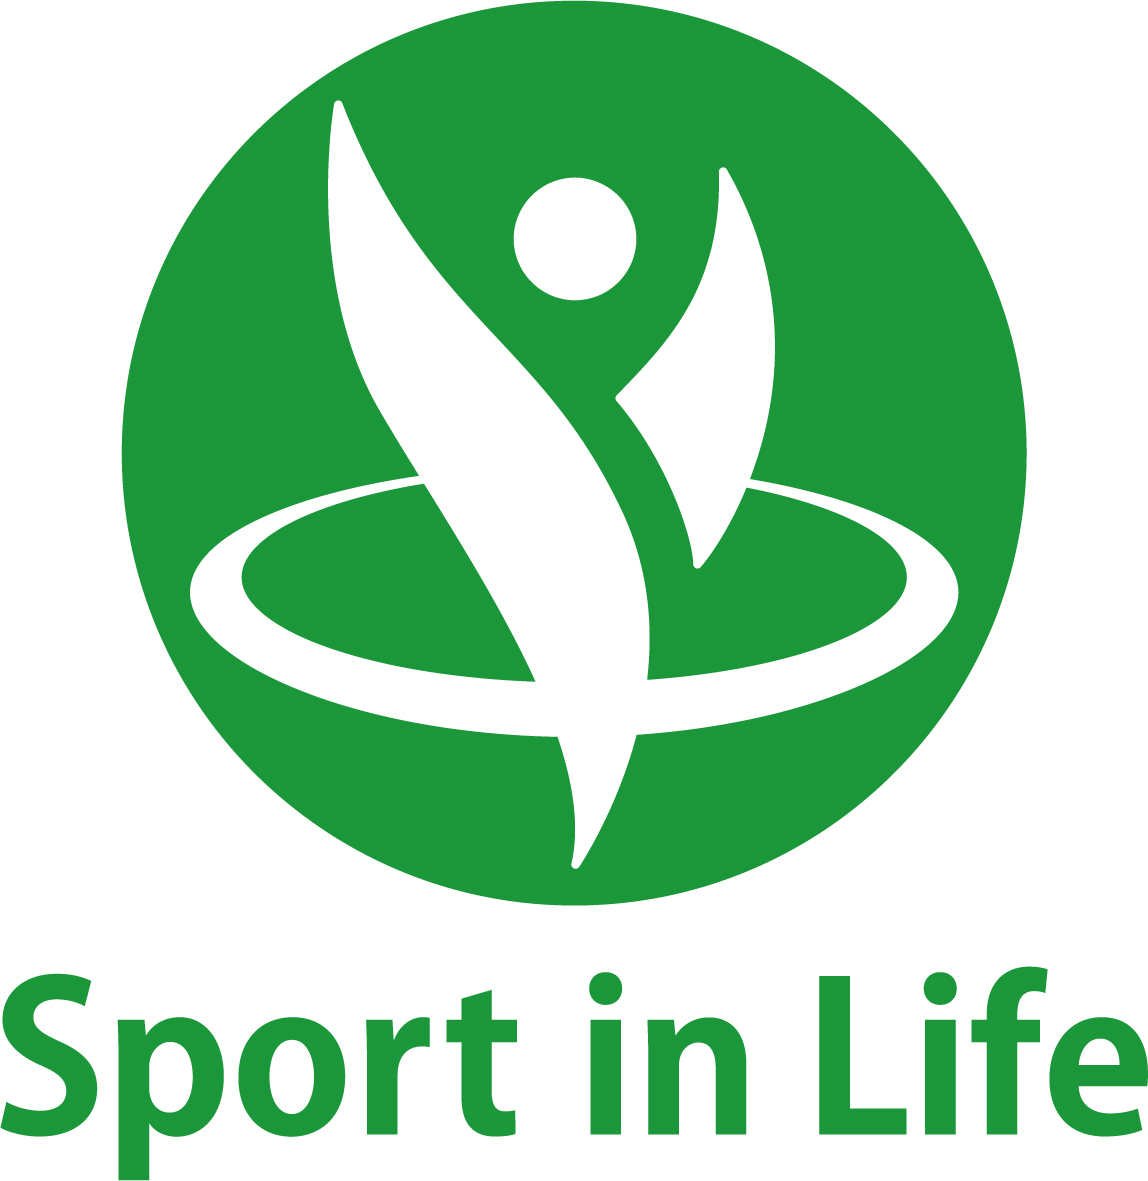 Goripediaは、スポーツ庁「Sport in life」に参画しています。